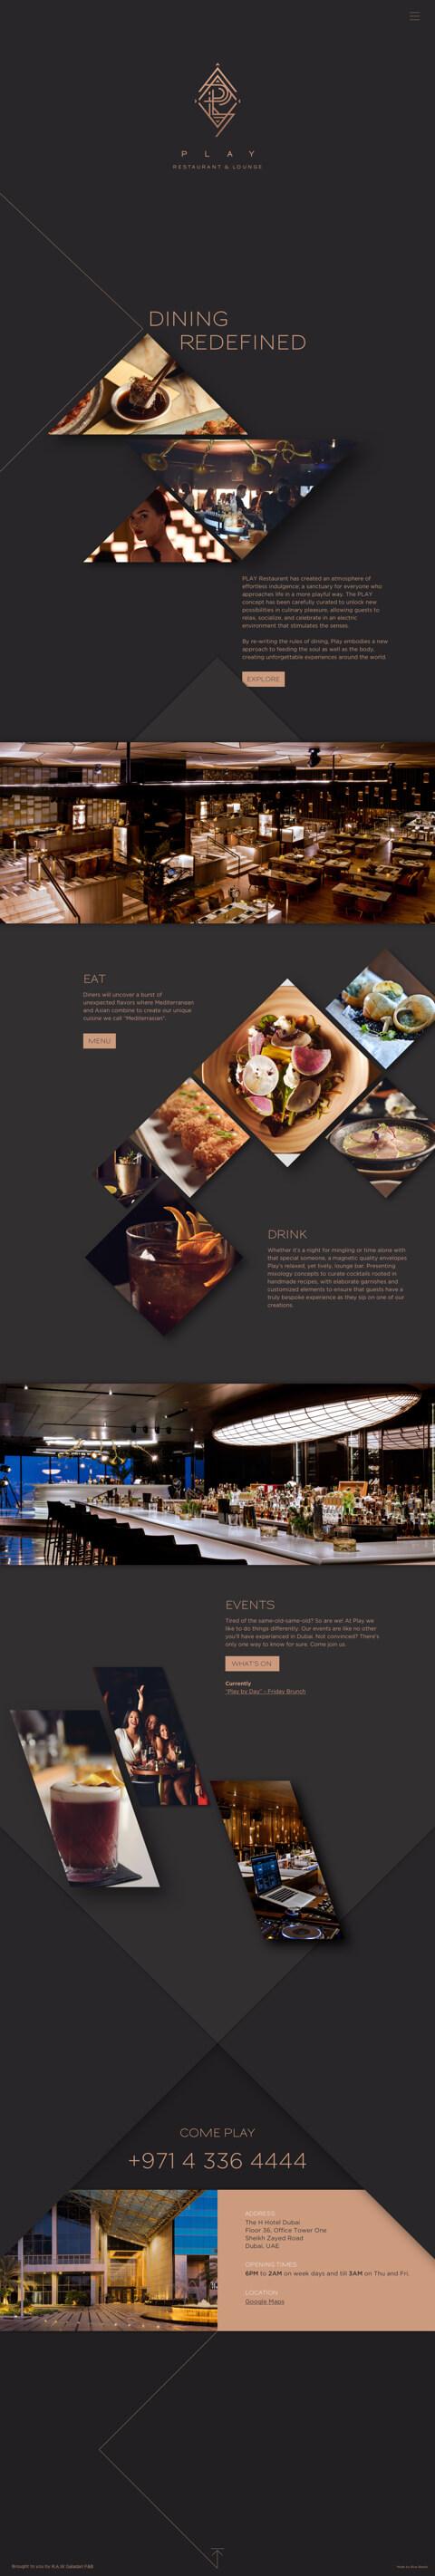 Rove Hotel Website